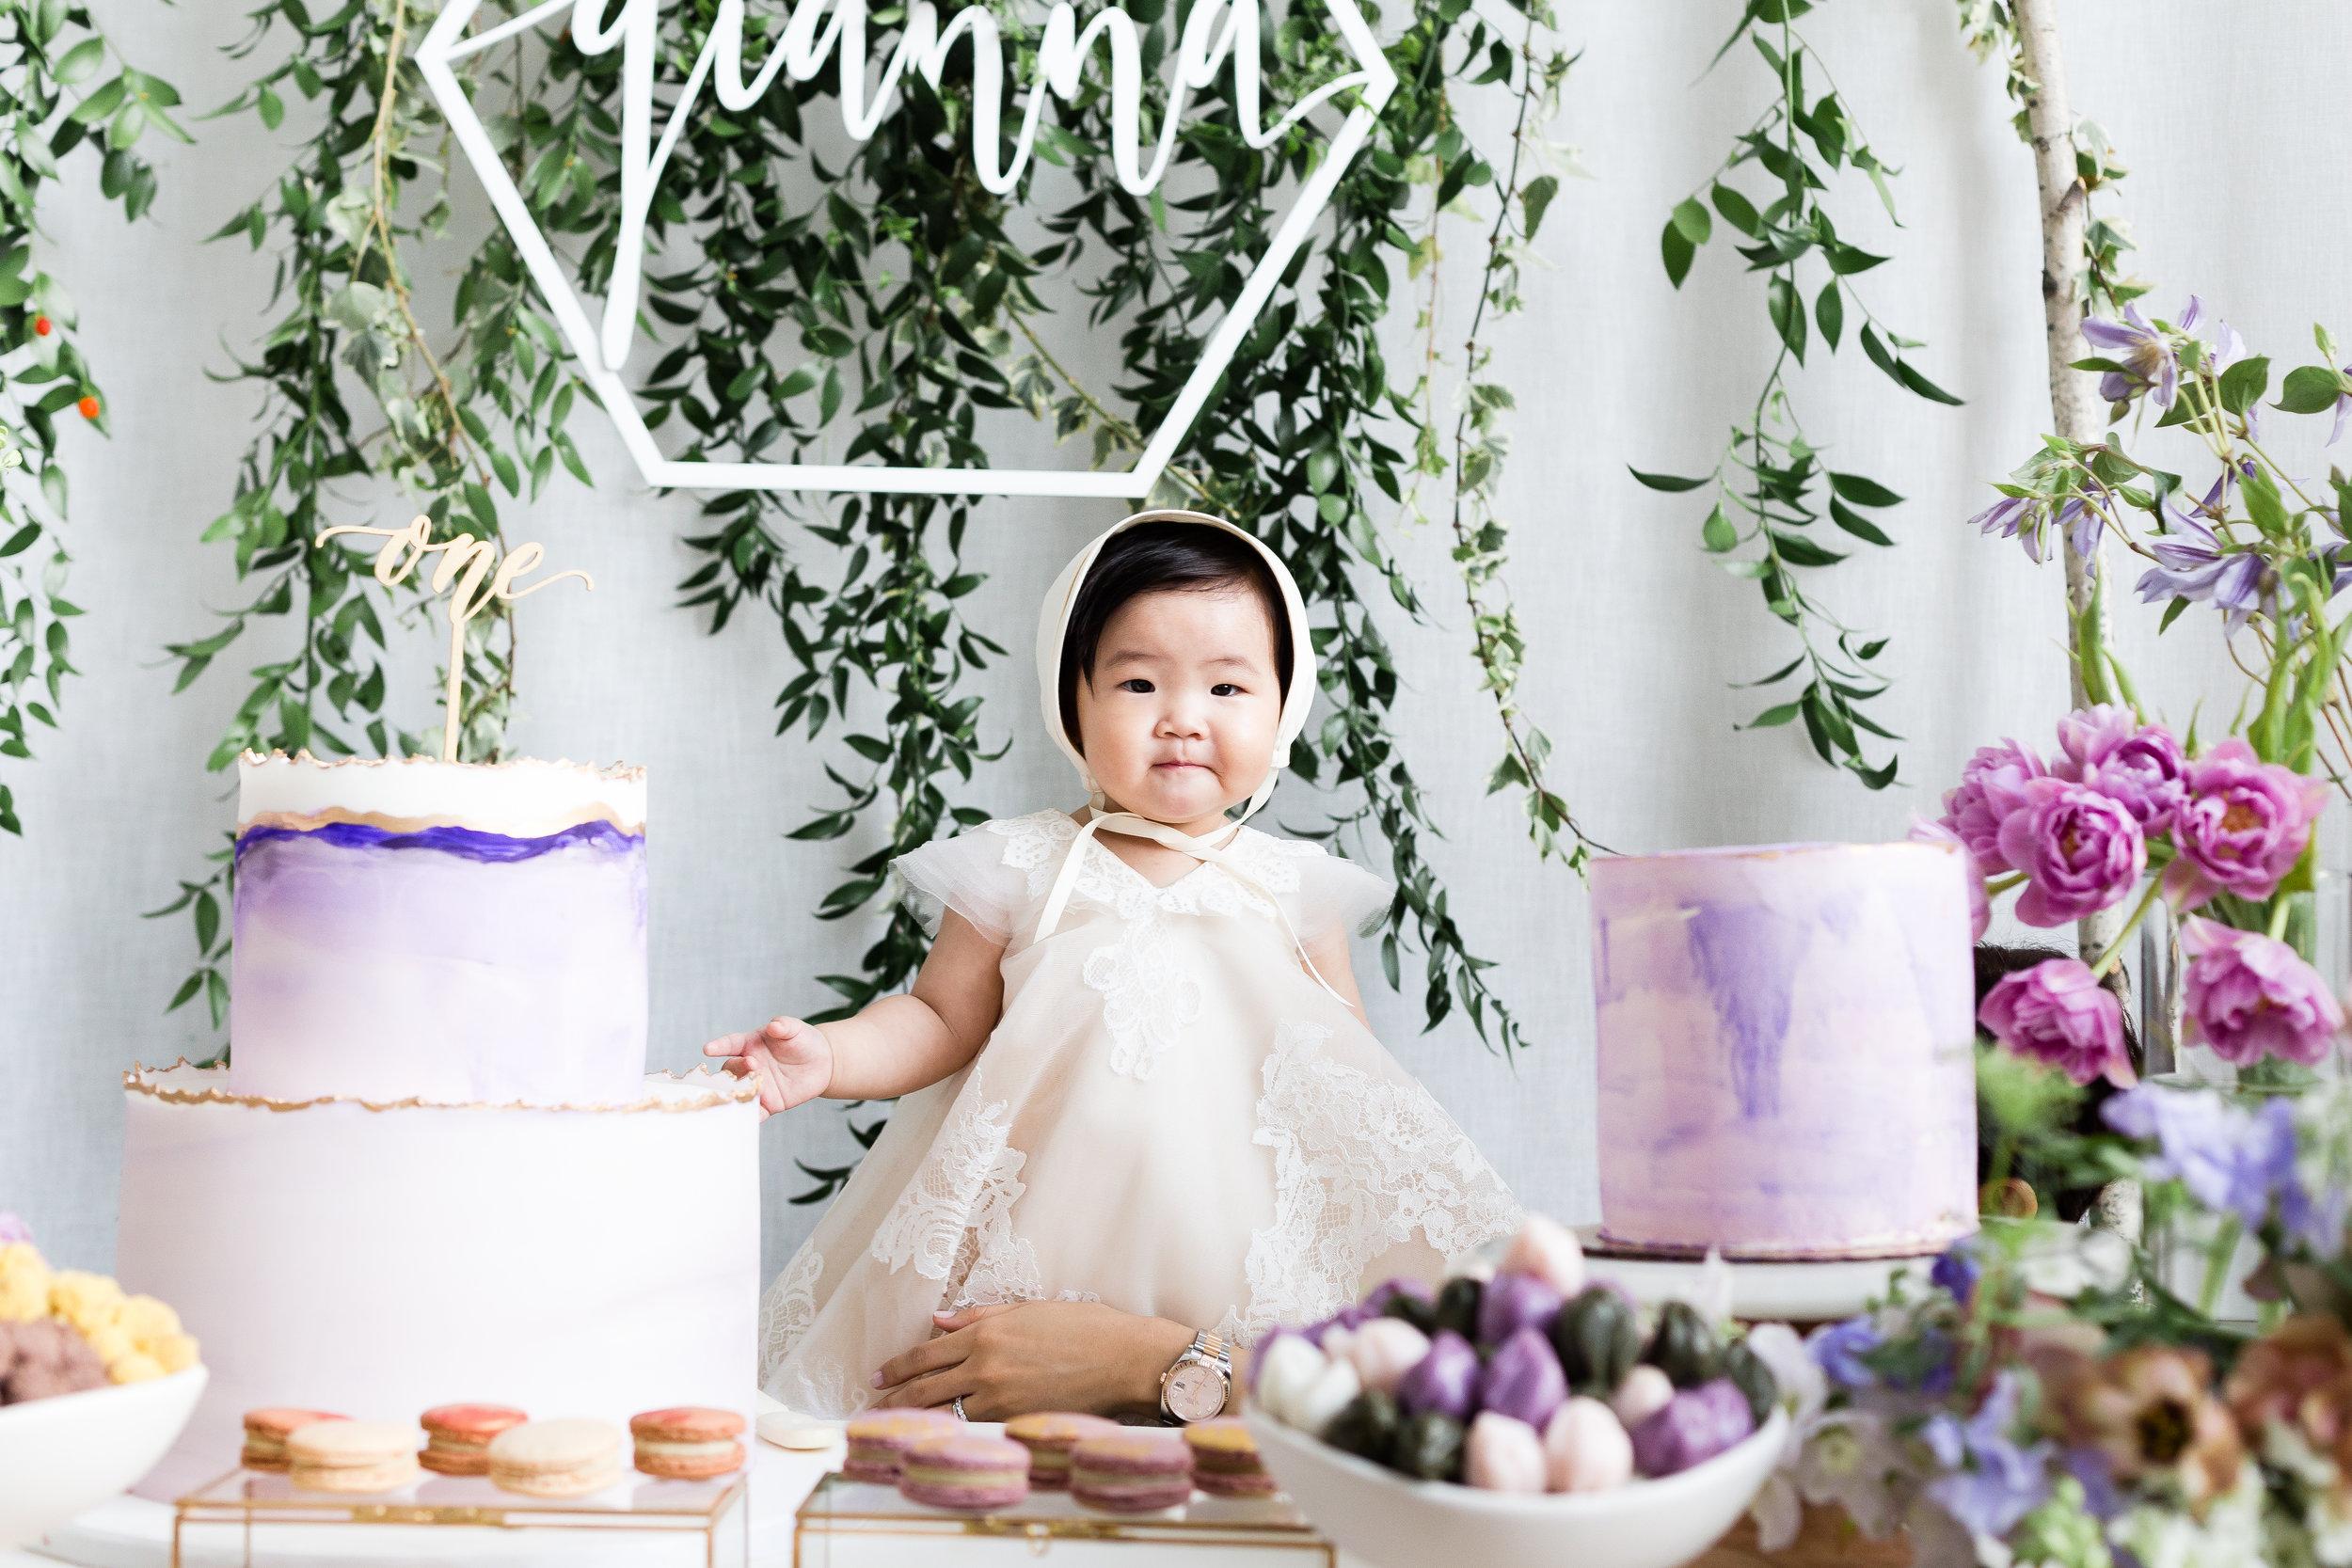 lissie_loomis_nyc_event_baby_photographer14.JPG